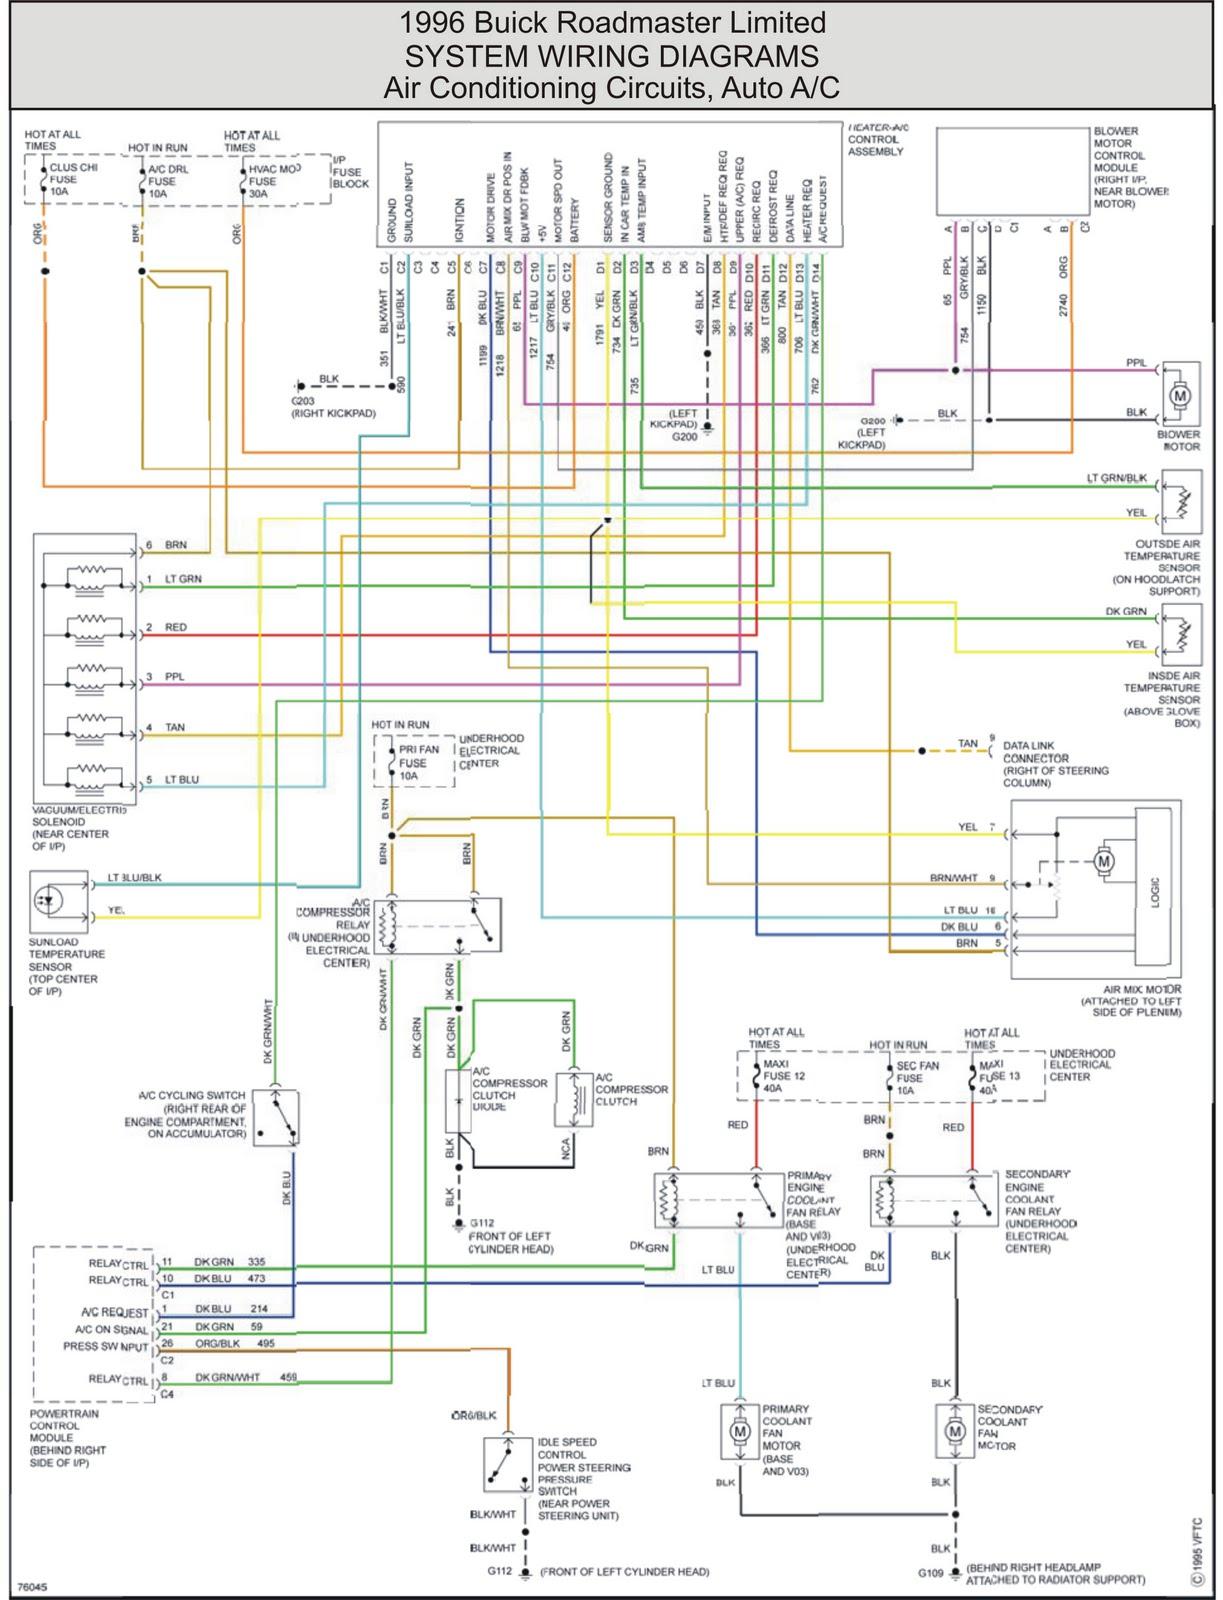 1995 Buick Regal Wiring Diagram - 1979 Club Car Wiring Diagram for Wiring  Diagram SchematicsWiring Diagram Schematics